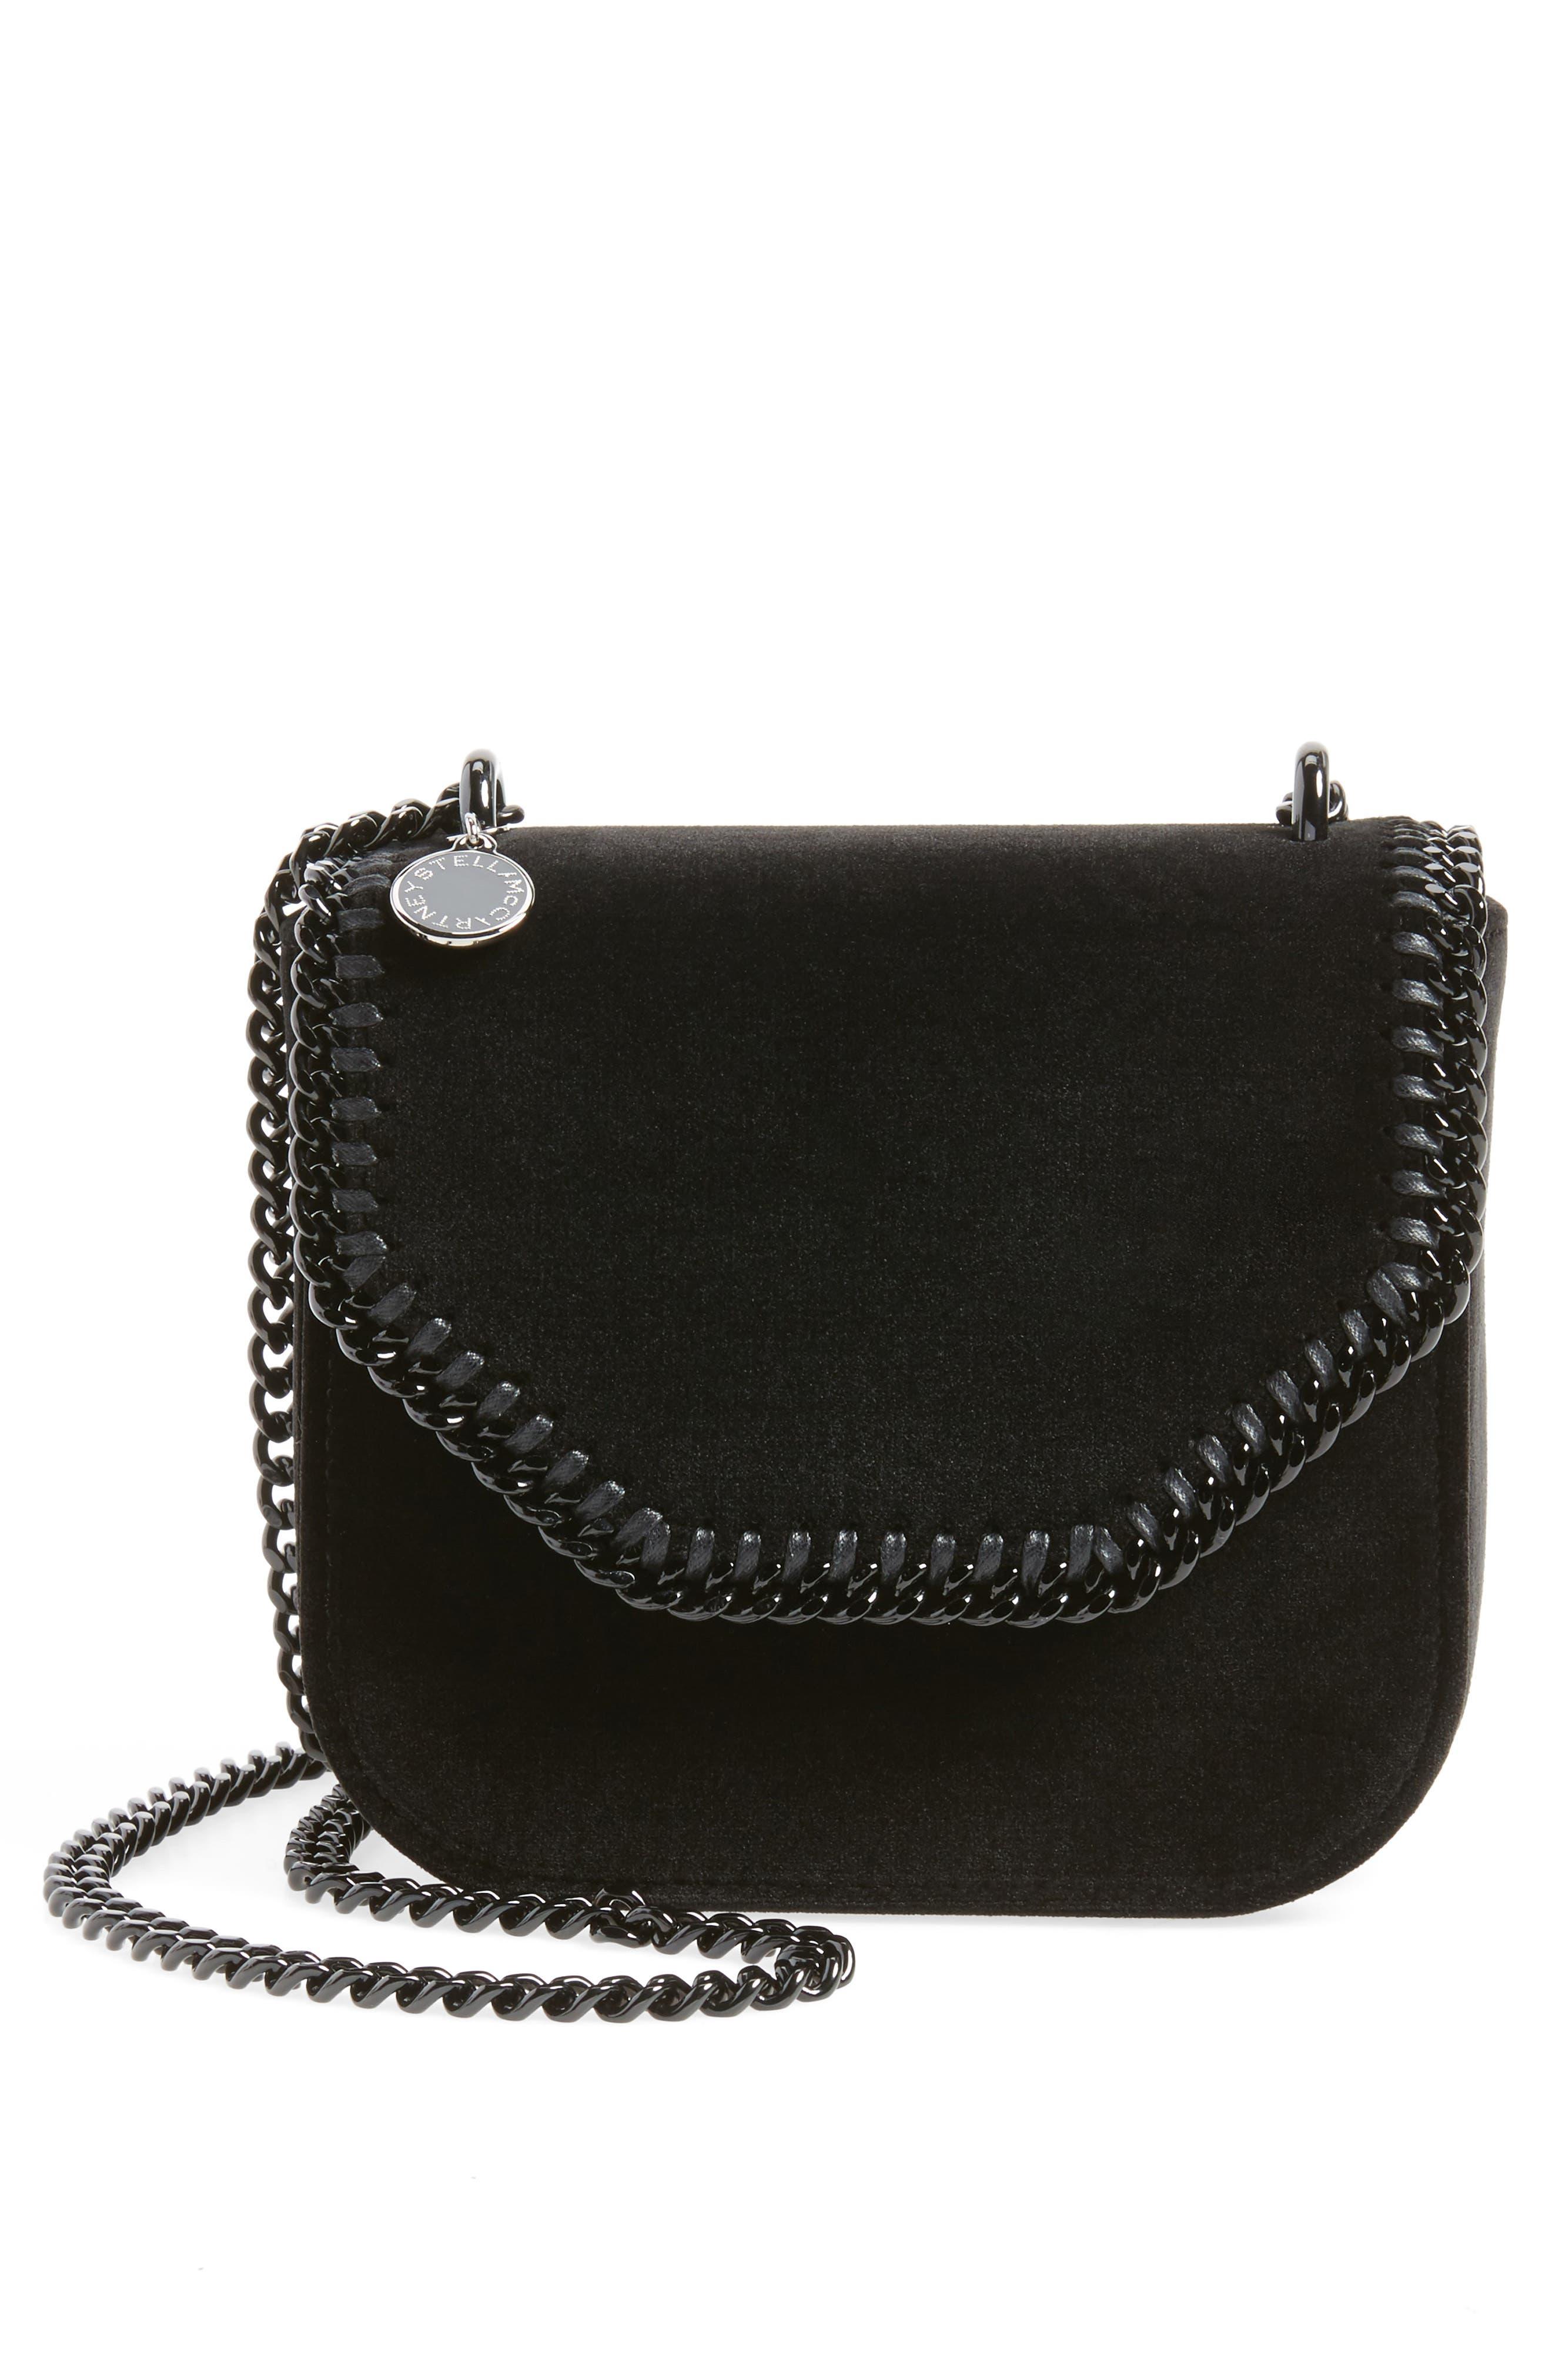 Stella McCartney Mini Falabella Box Velvet Shoulder Bag